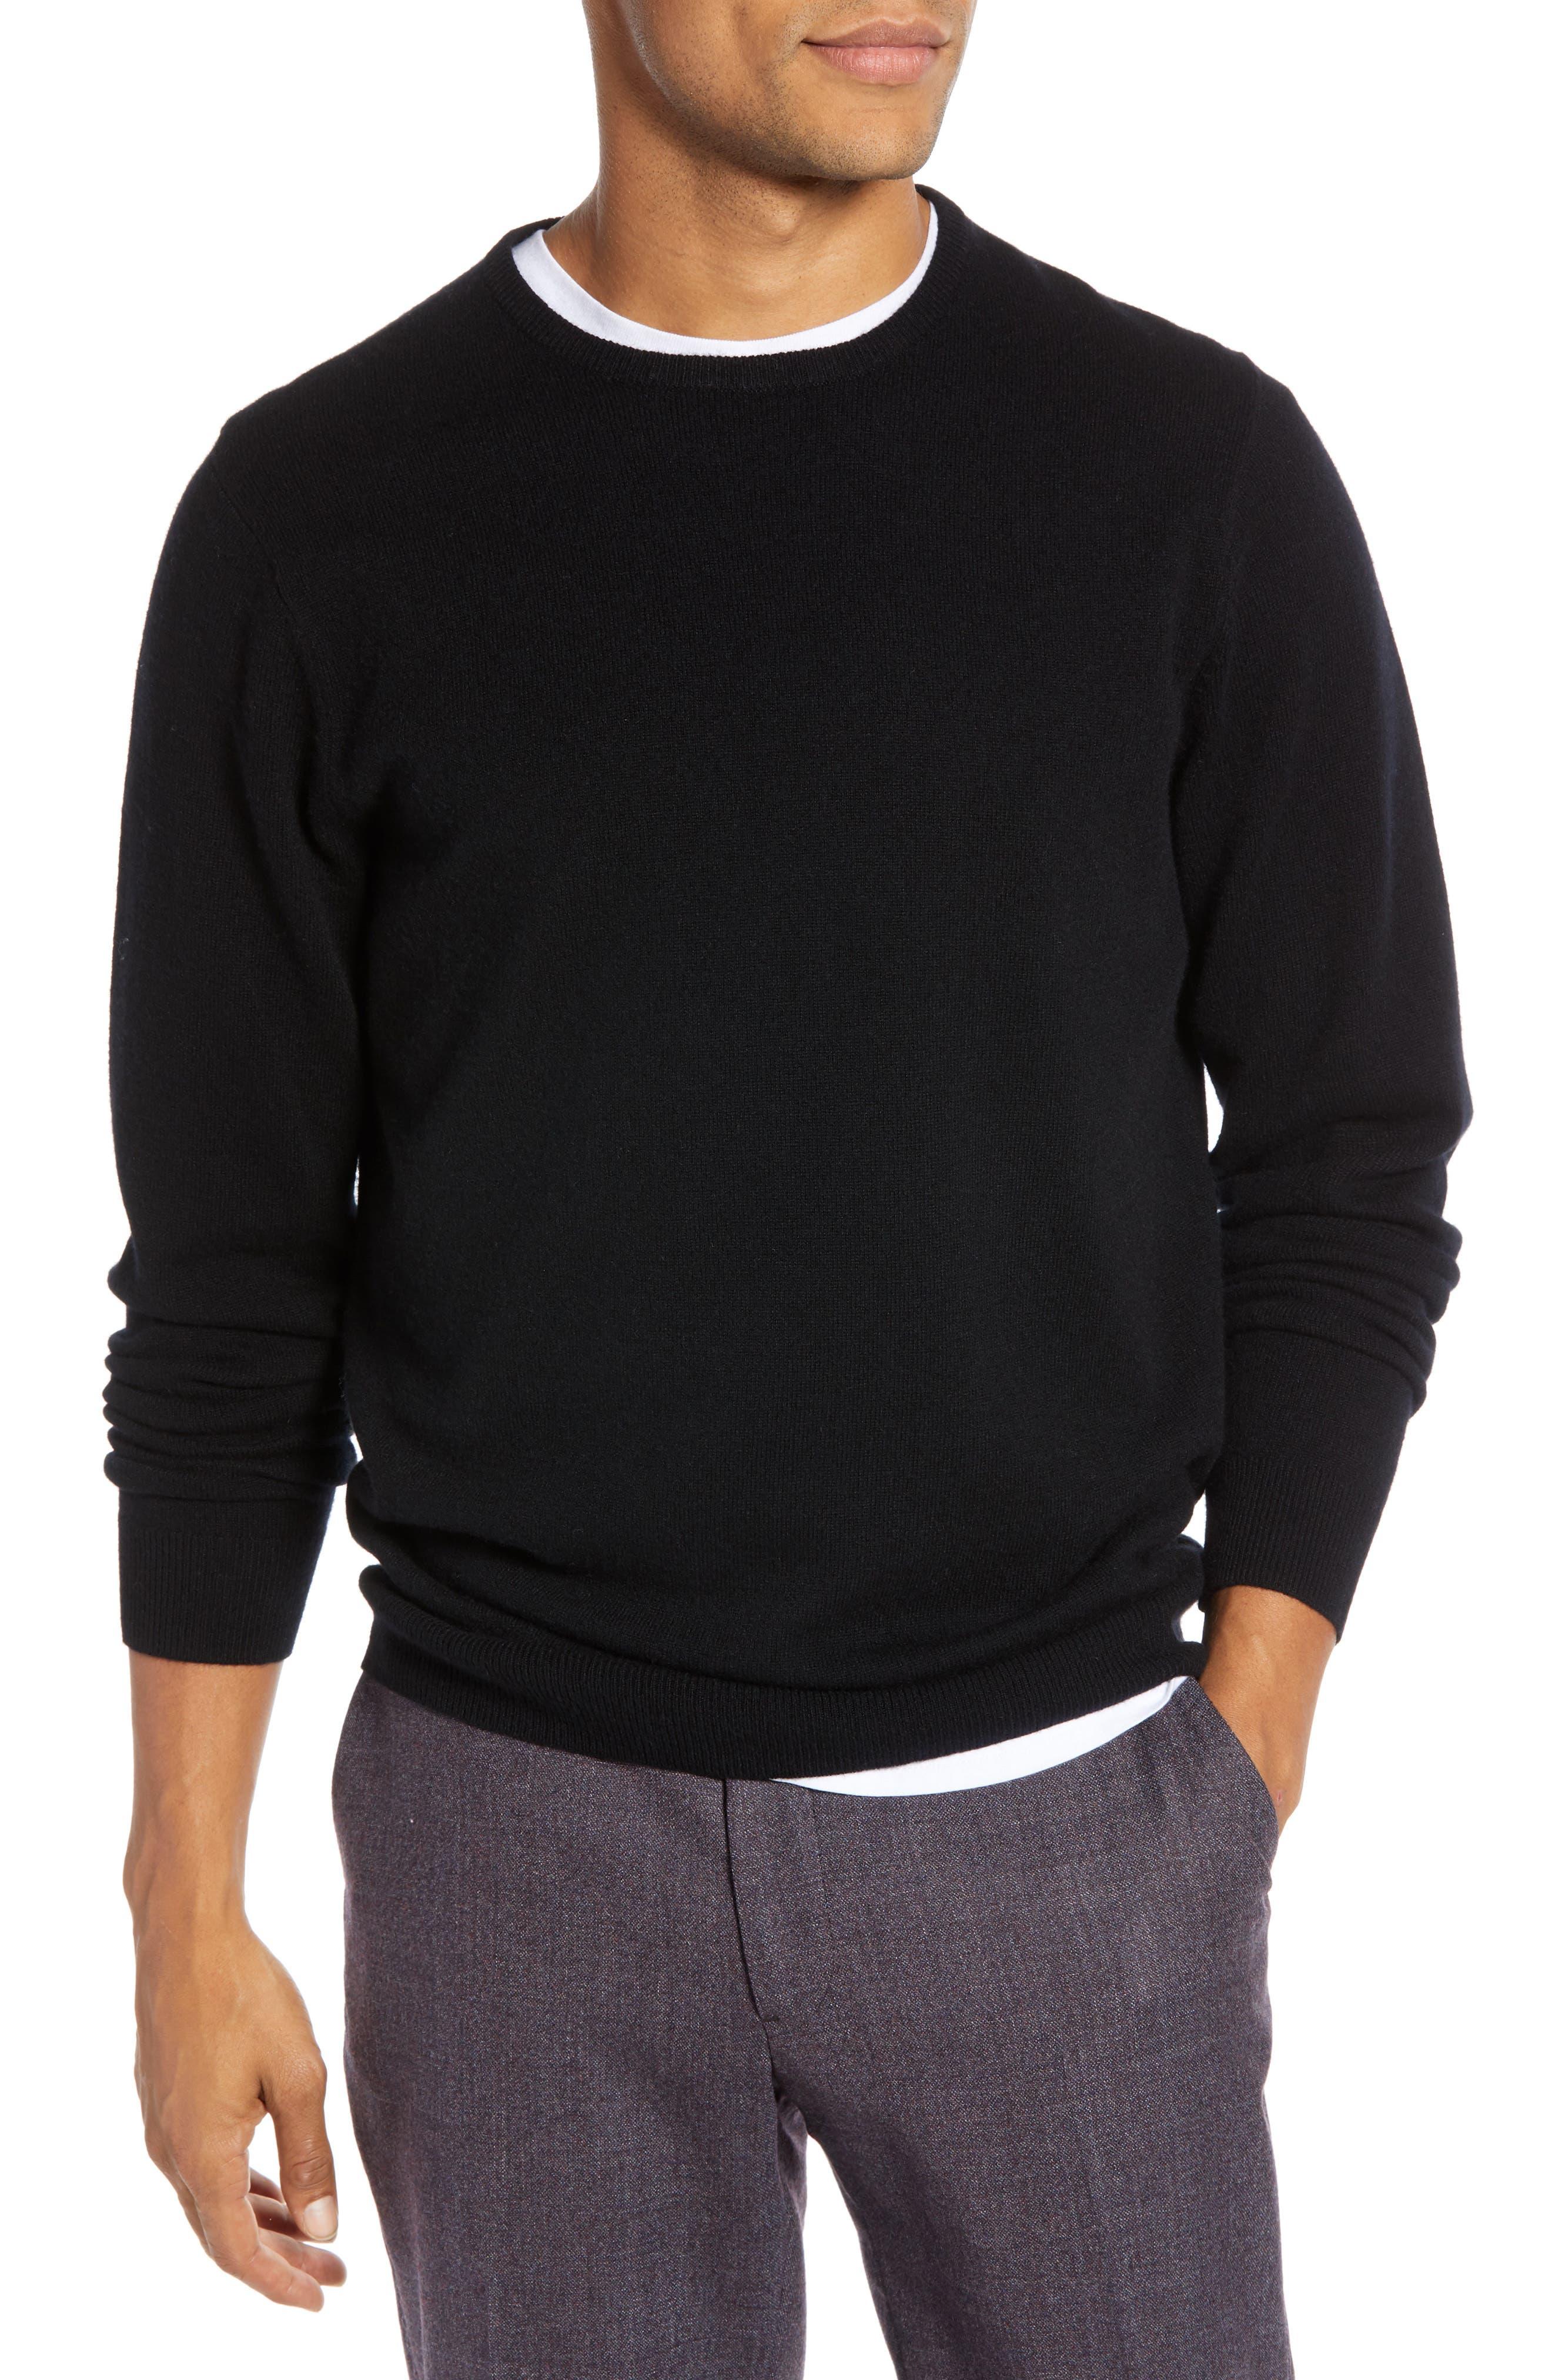 Regular Fit Wool & Cashmere Sweater,                             Main thumbnail 1, color,                             BLACK CAVIAR